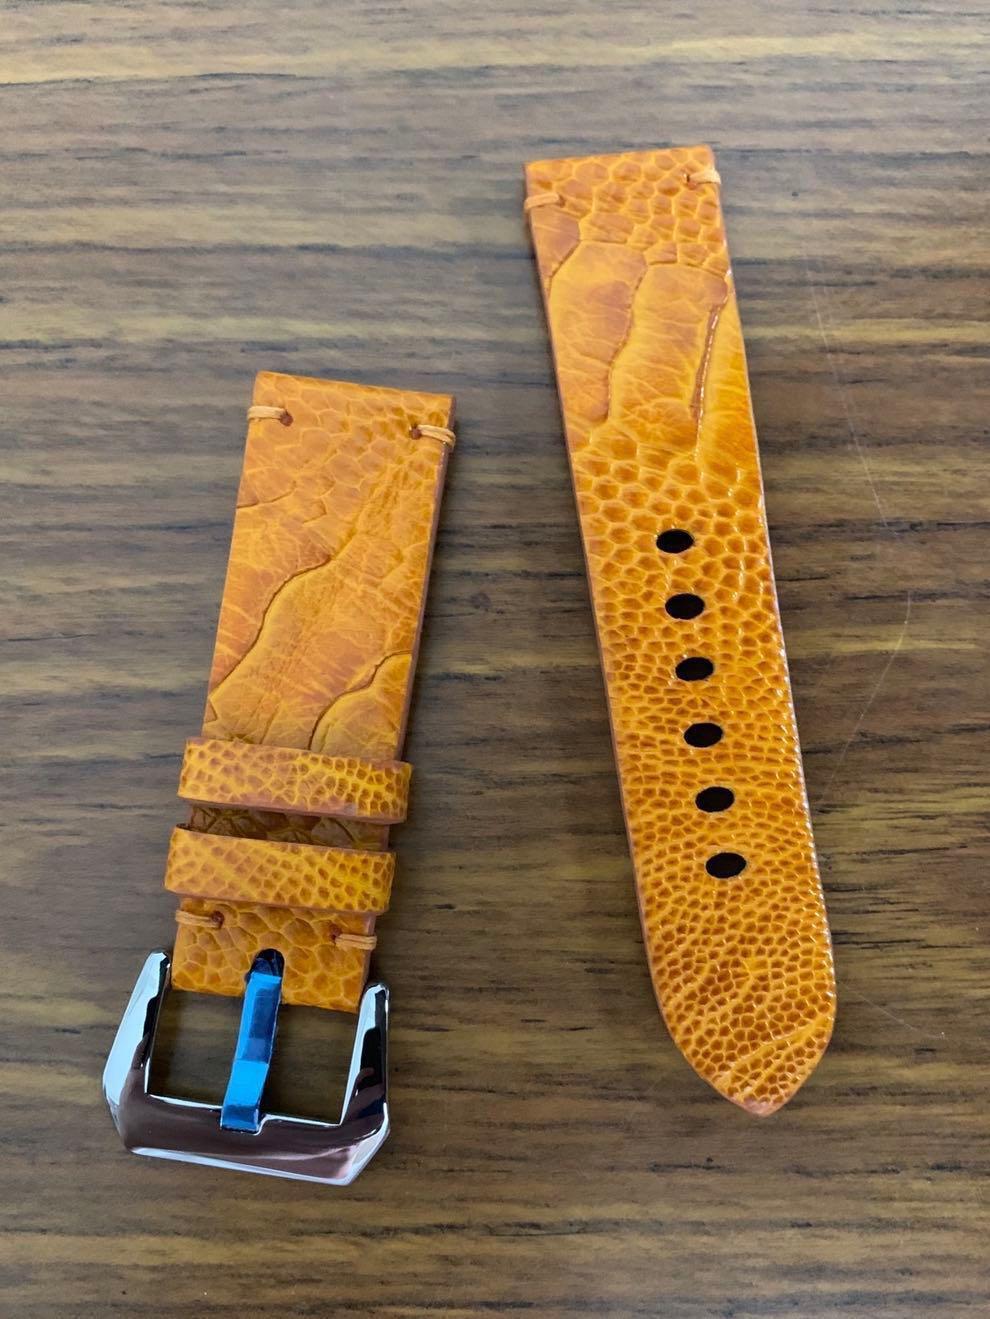 24mm/22mm Authentic Golden Sunrise Brown Ostrich Leg Watch Strap - (22mm tang buckle- compatible dimension as OEM panerai buckle) #MRTHougang #MRTSerangoon #MRTSengkang #MRTPunggol #MRTRaffles #MRTBedok #MRTTampines #MRTCCK #MRTJurongEast #MRTYishun